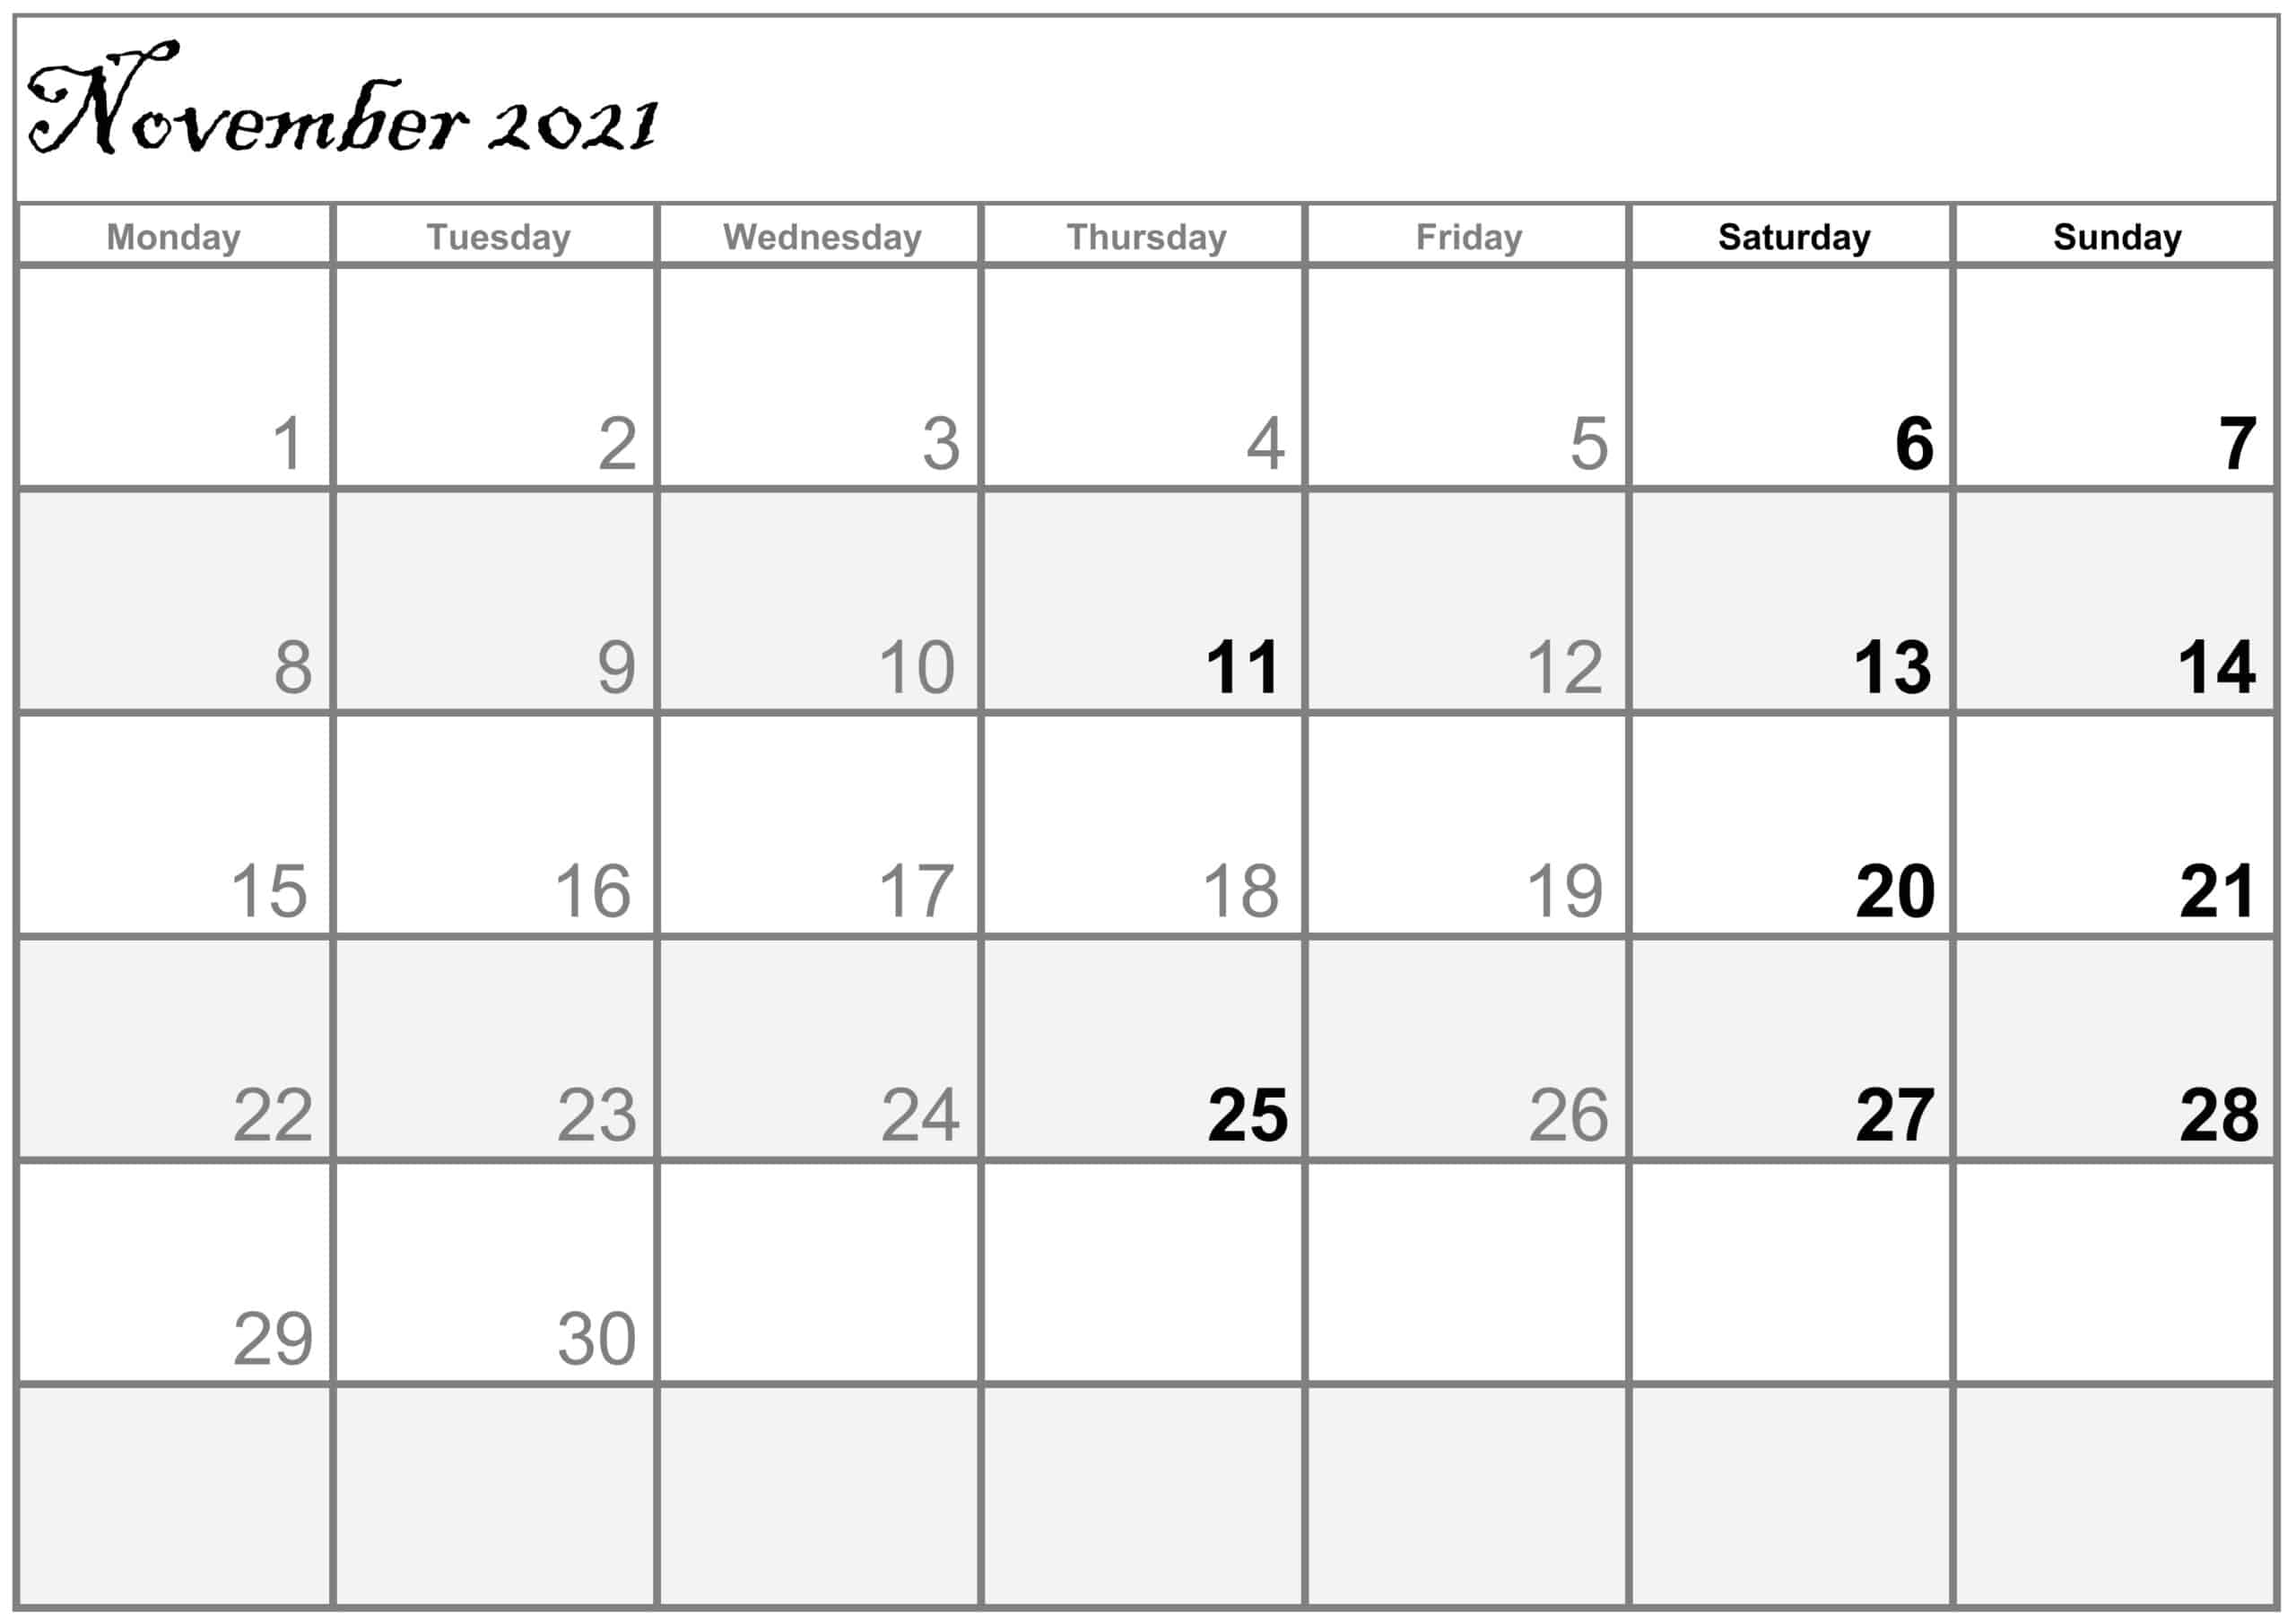 Excel November 2021 Calendar free